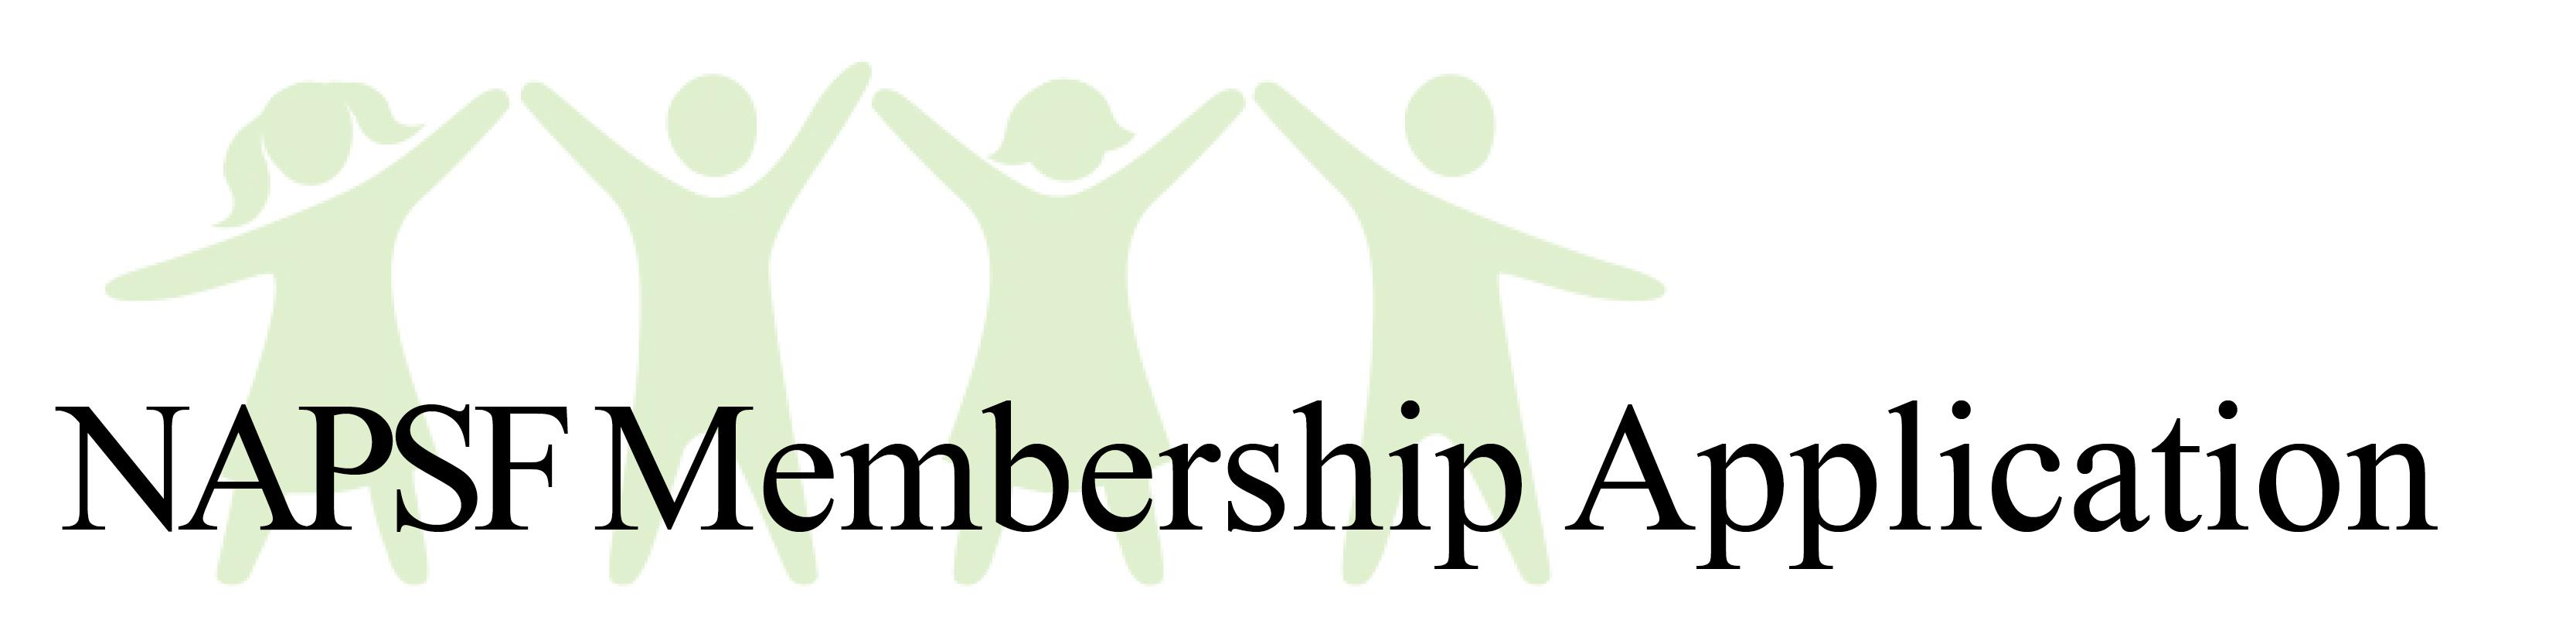 2019-2020 NAPSF Membership Drive